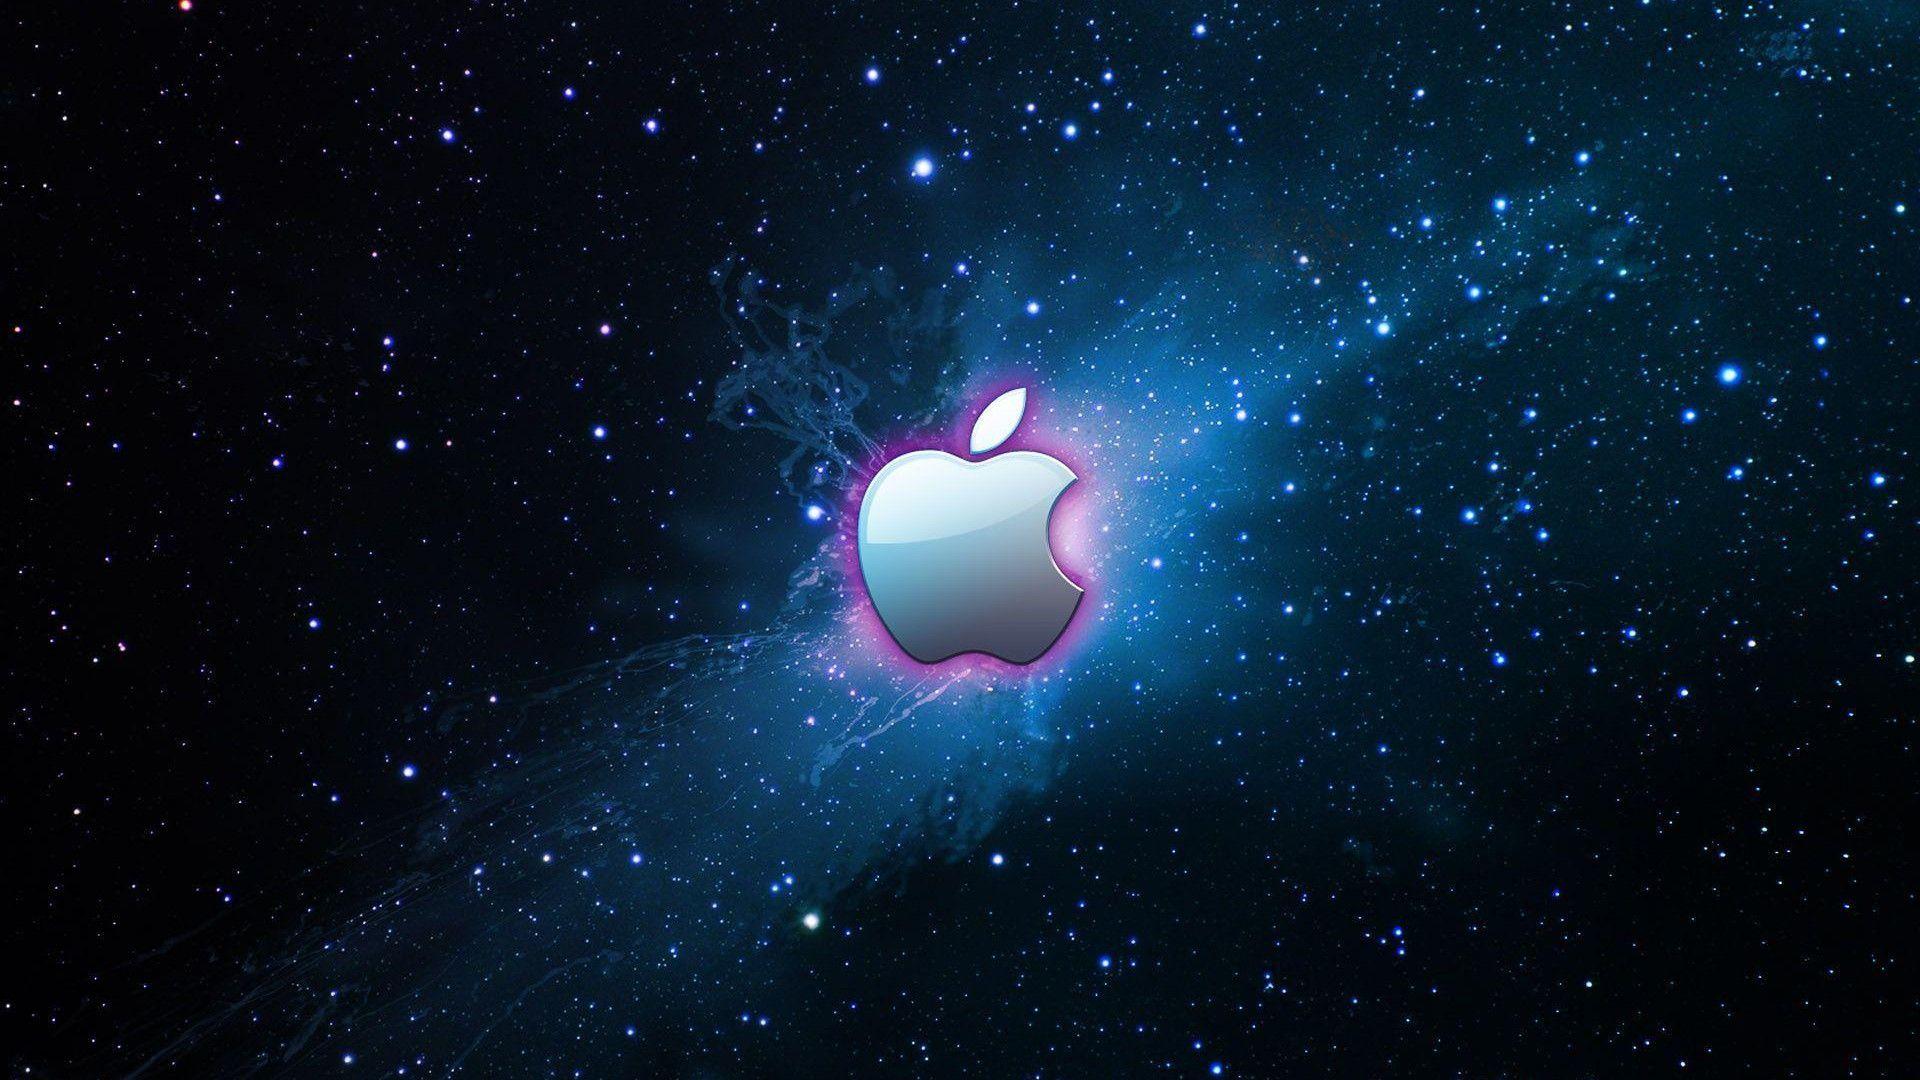 Apple Ipad free desktop background